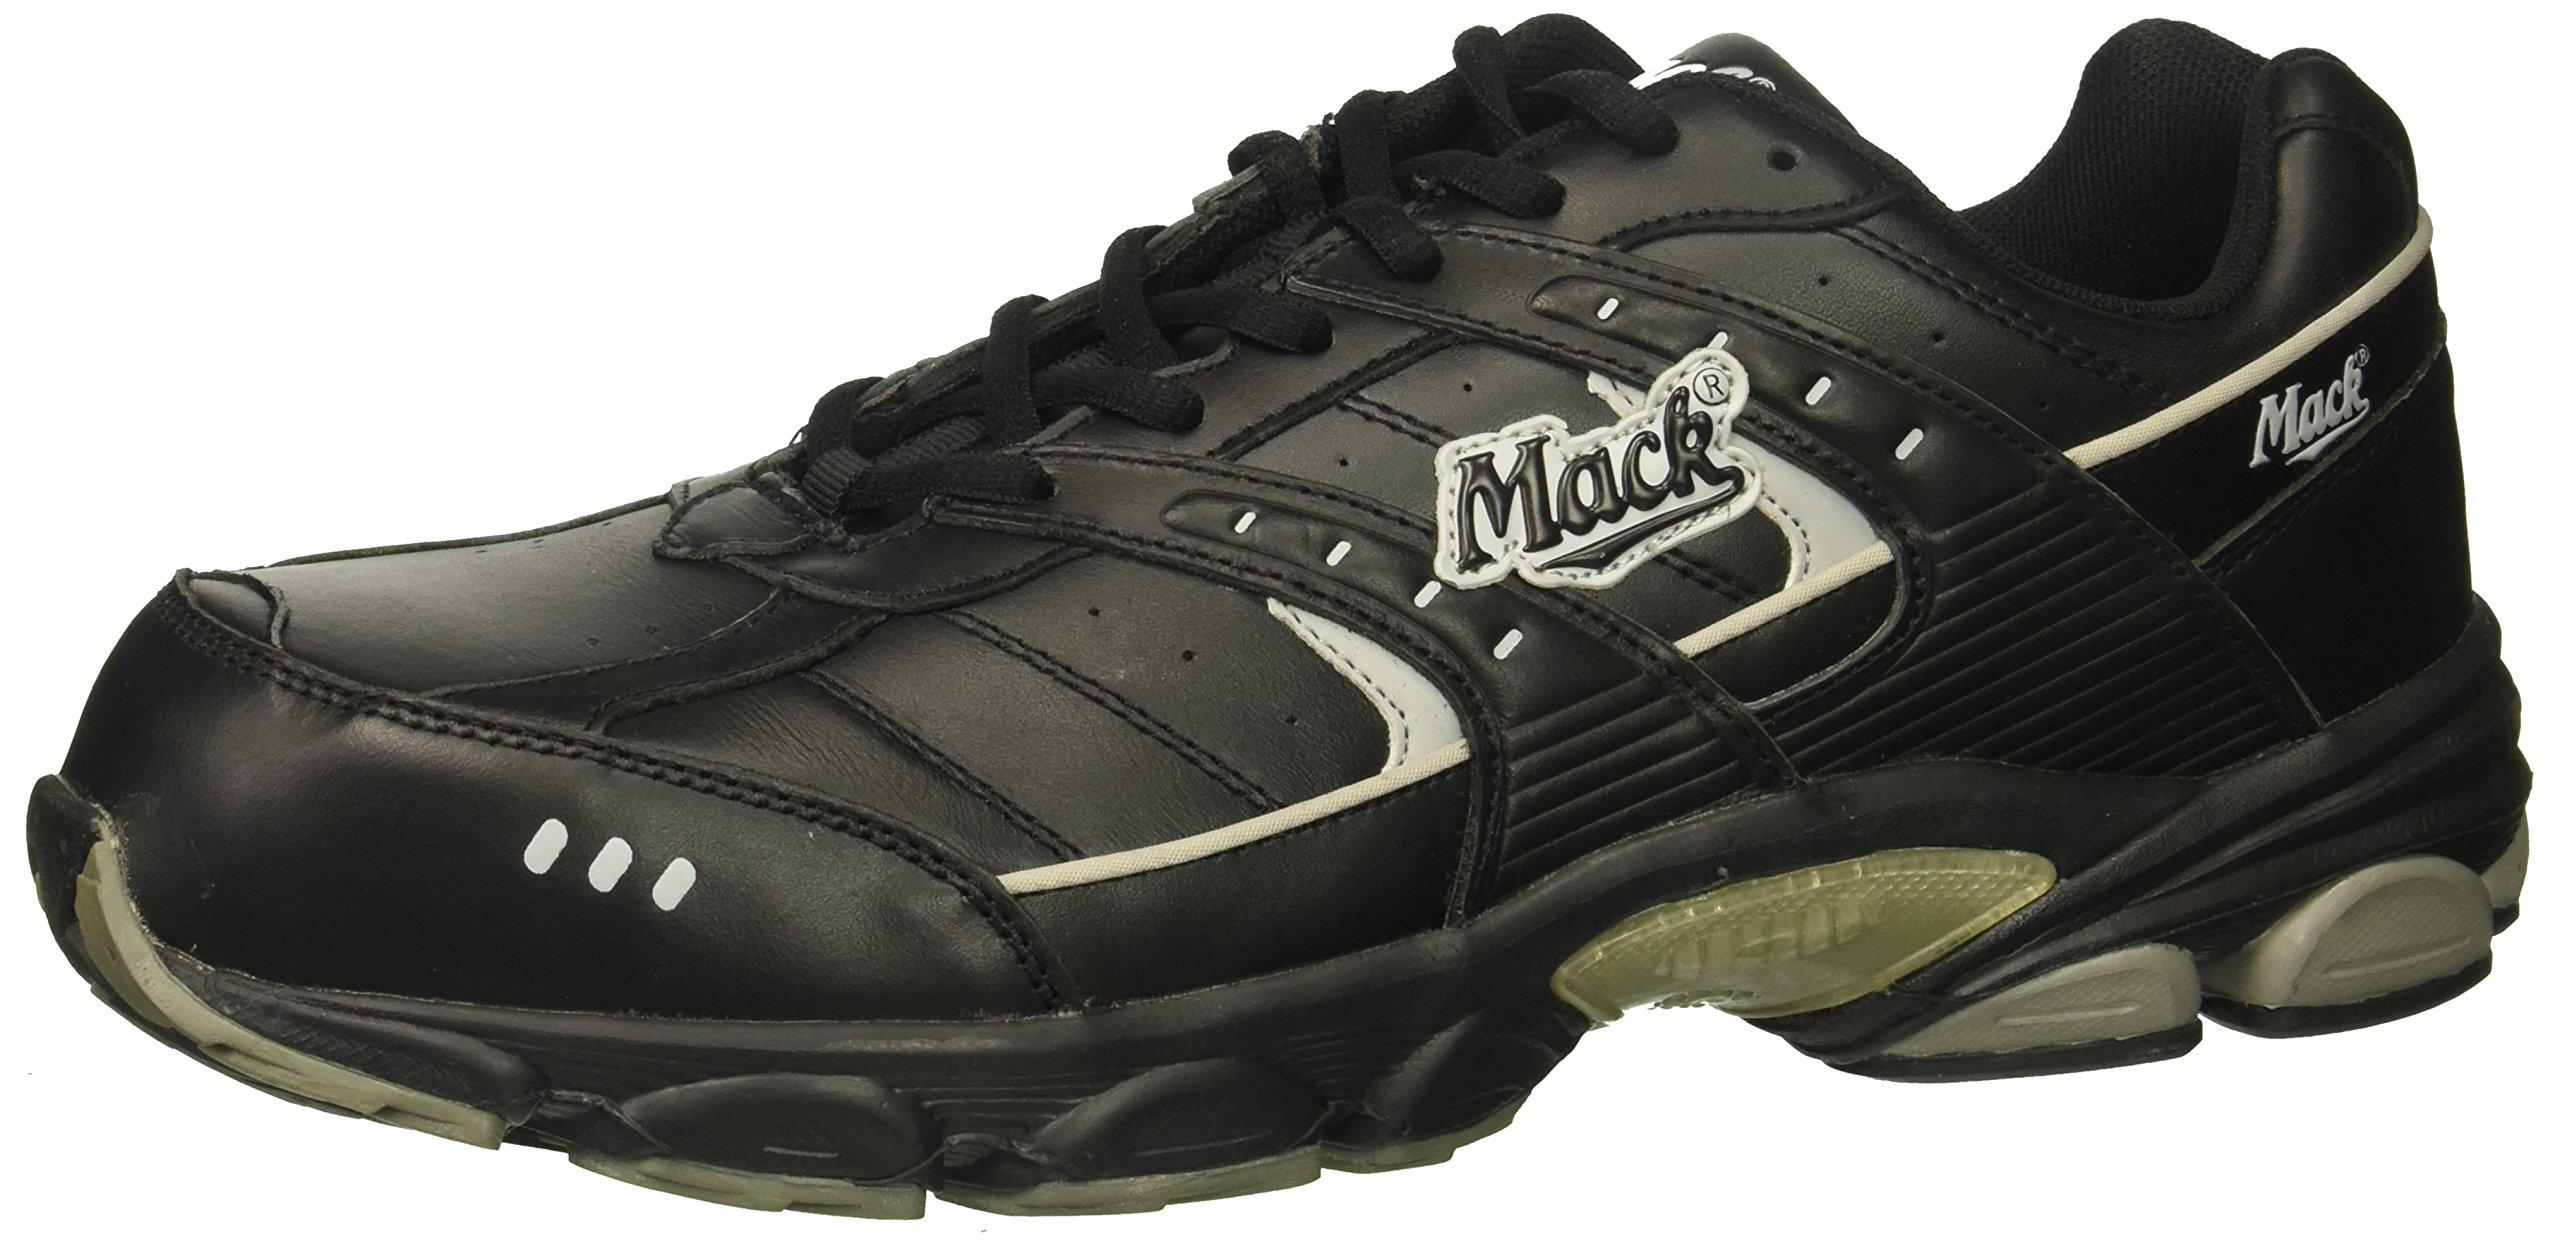 SAS Safety E93829121 Neptune Men's Shoe, Size 13